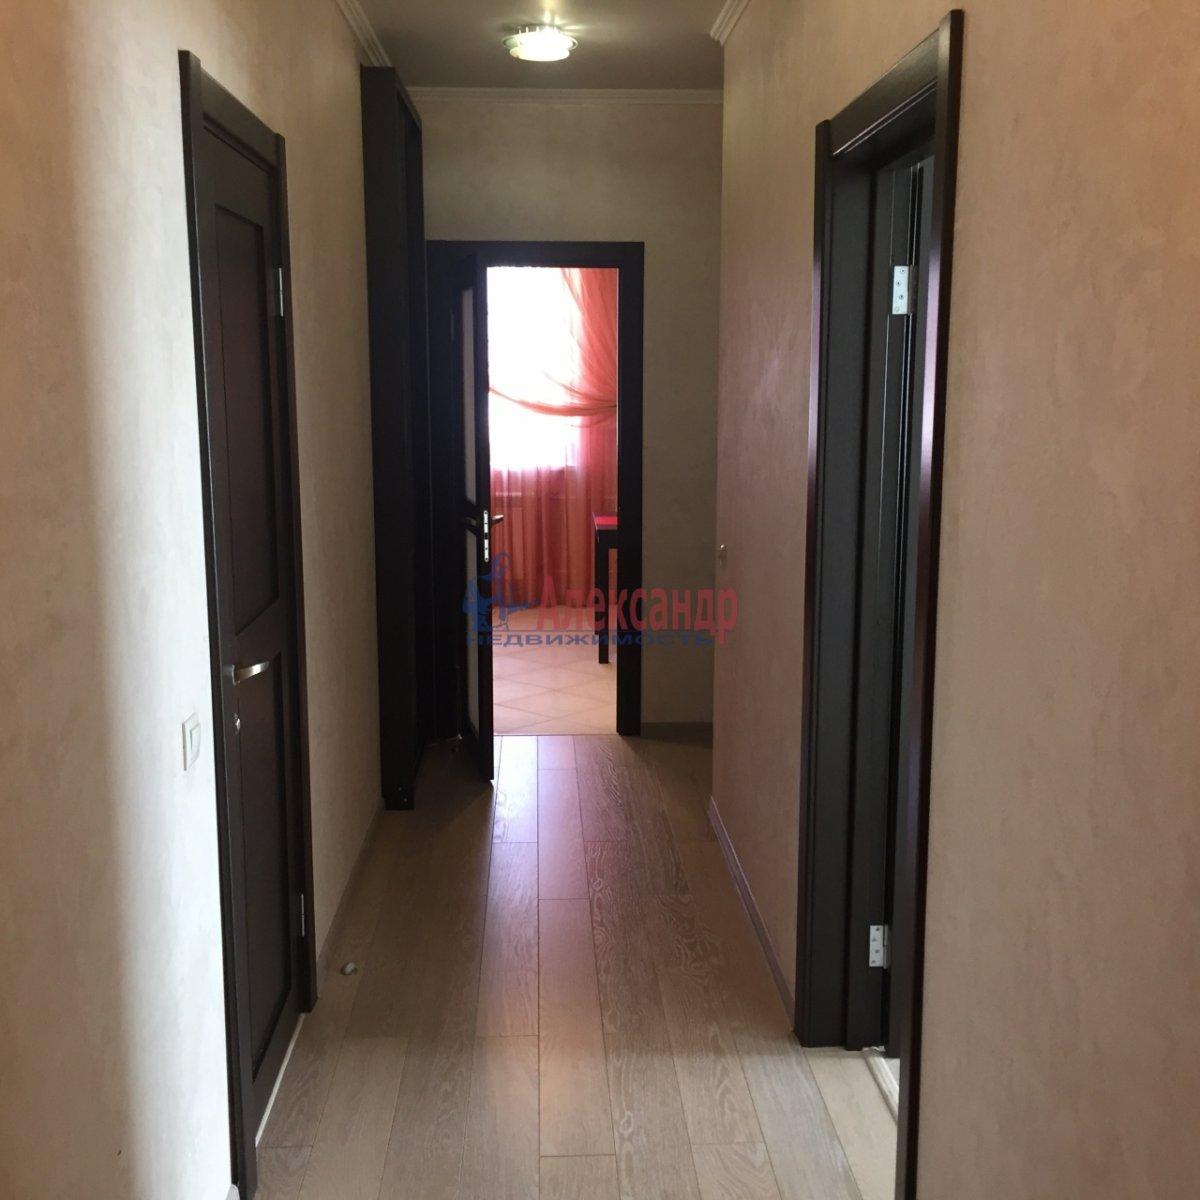 2-комнатная квартира (64м2) в аренду по адресу Белы Куна ул., 1— фото 8 из 9